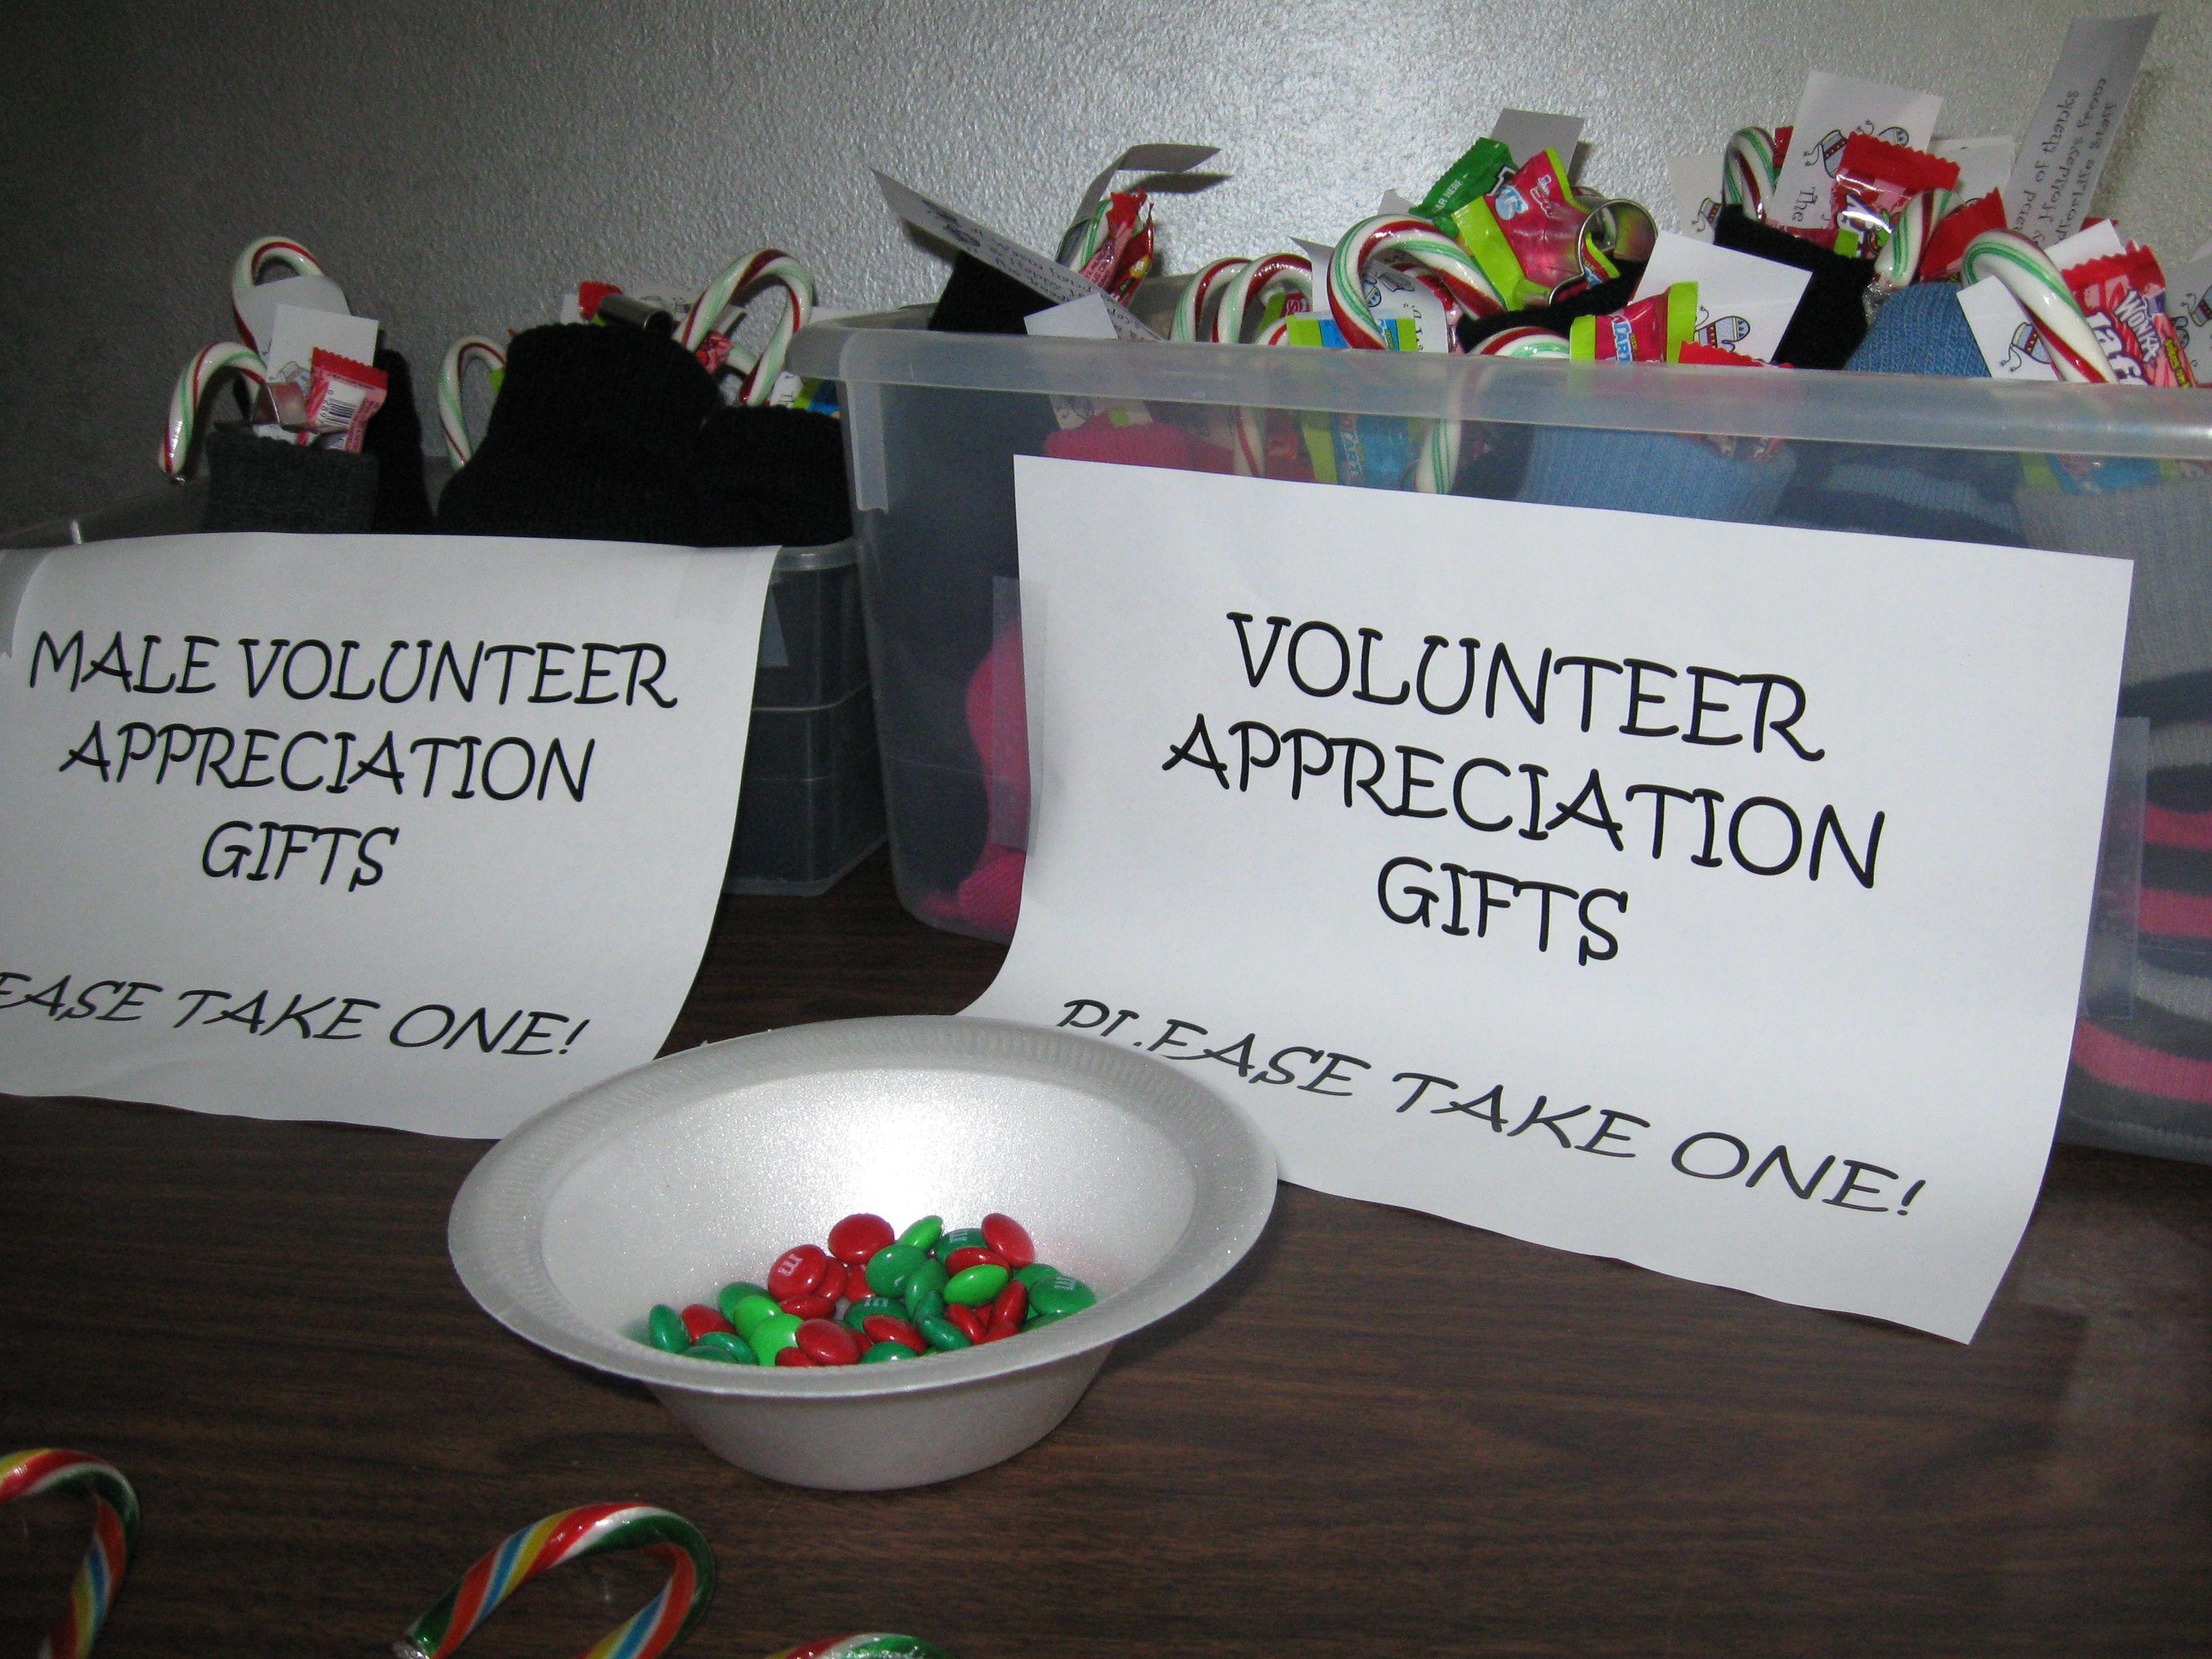 Volunteer Appreciation. (With images) | Volunteer ...